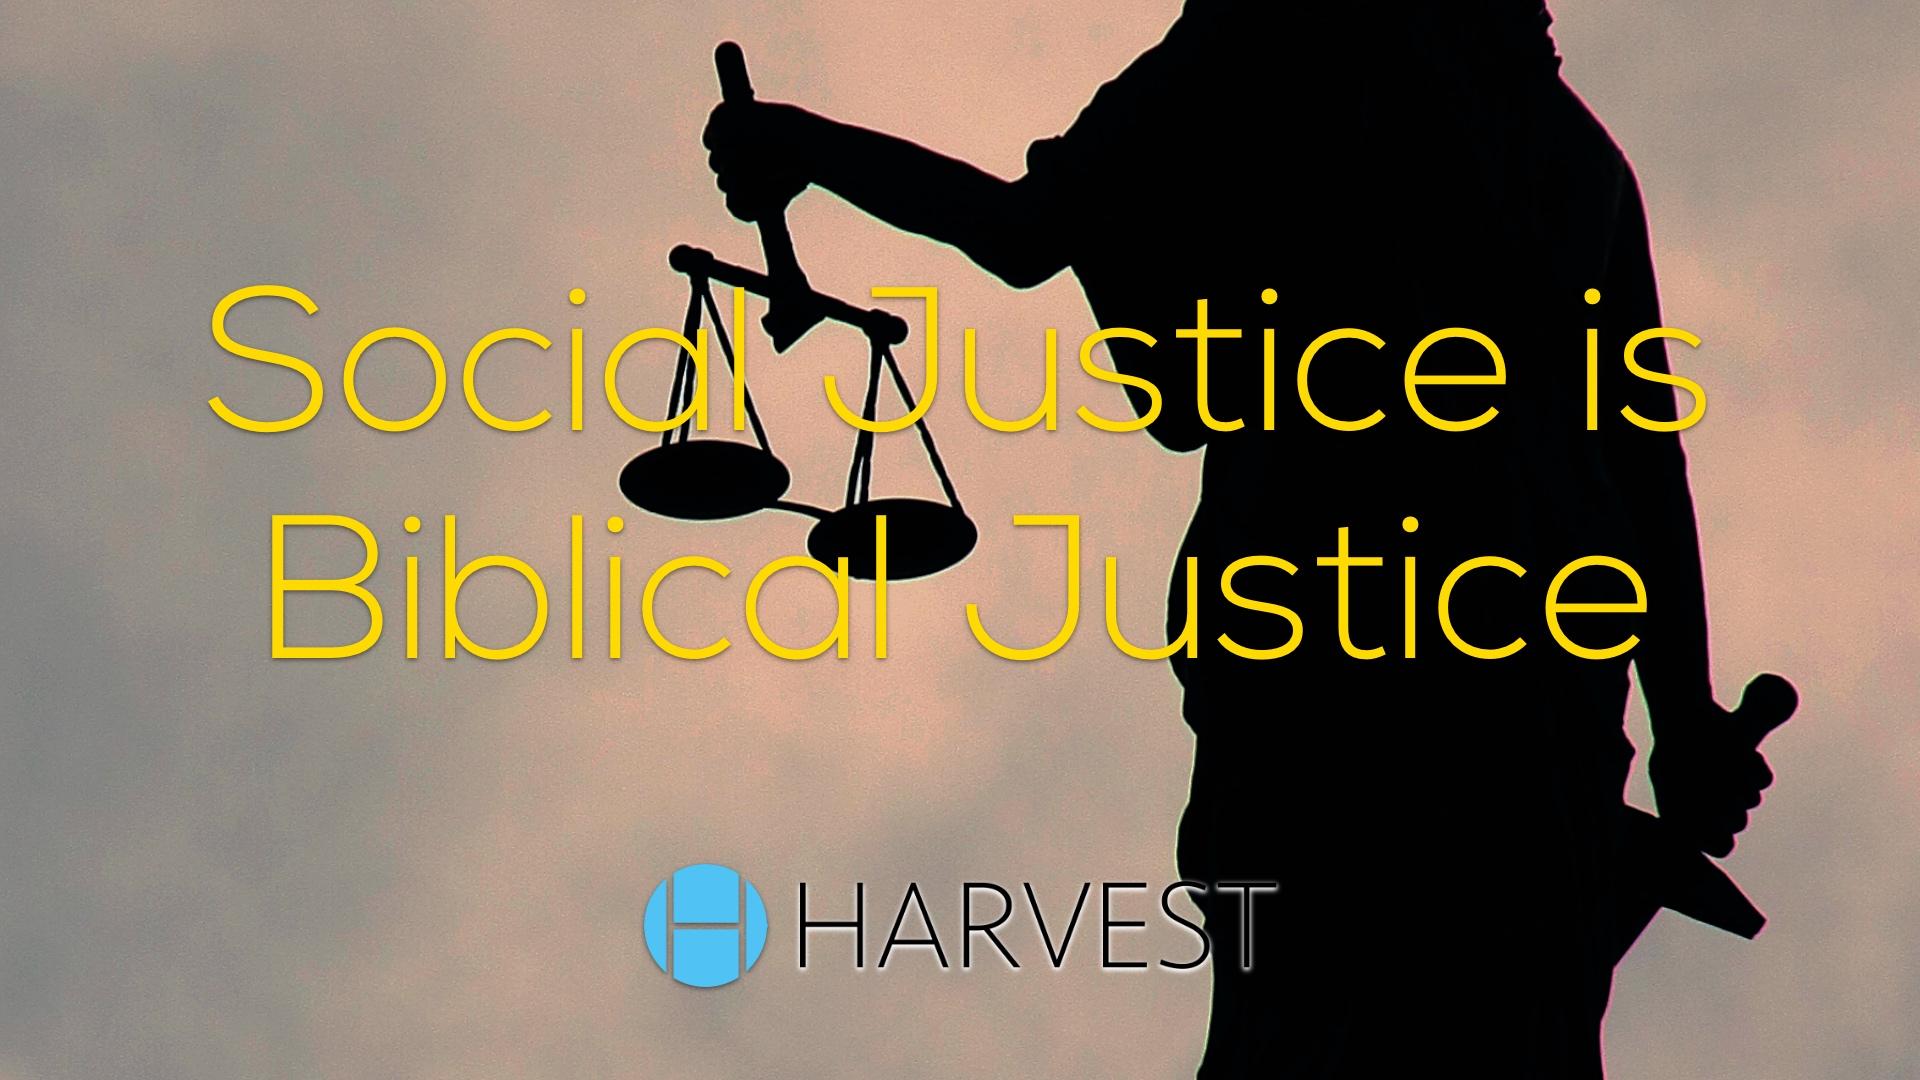 Social Justice is Biblical Justice